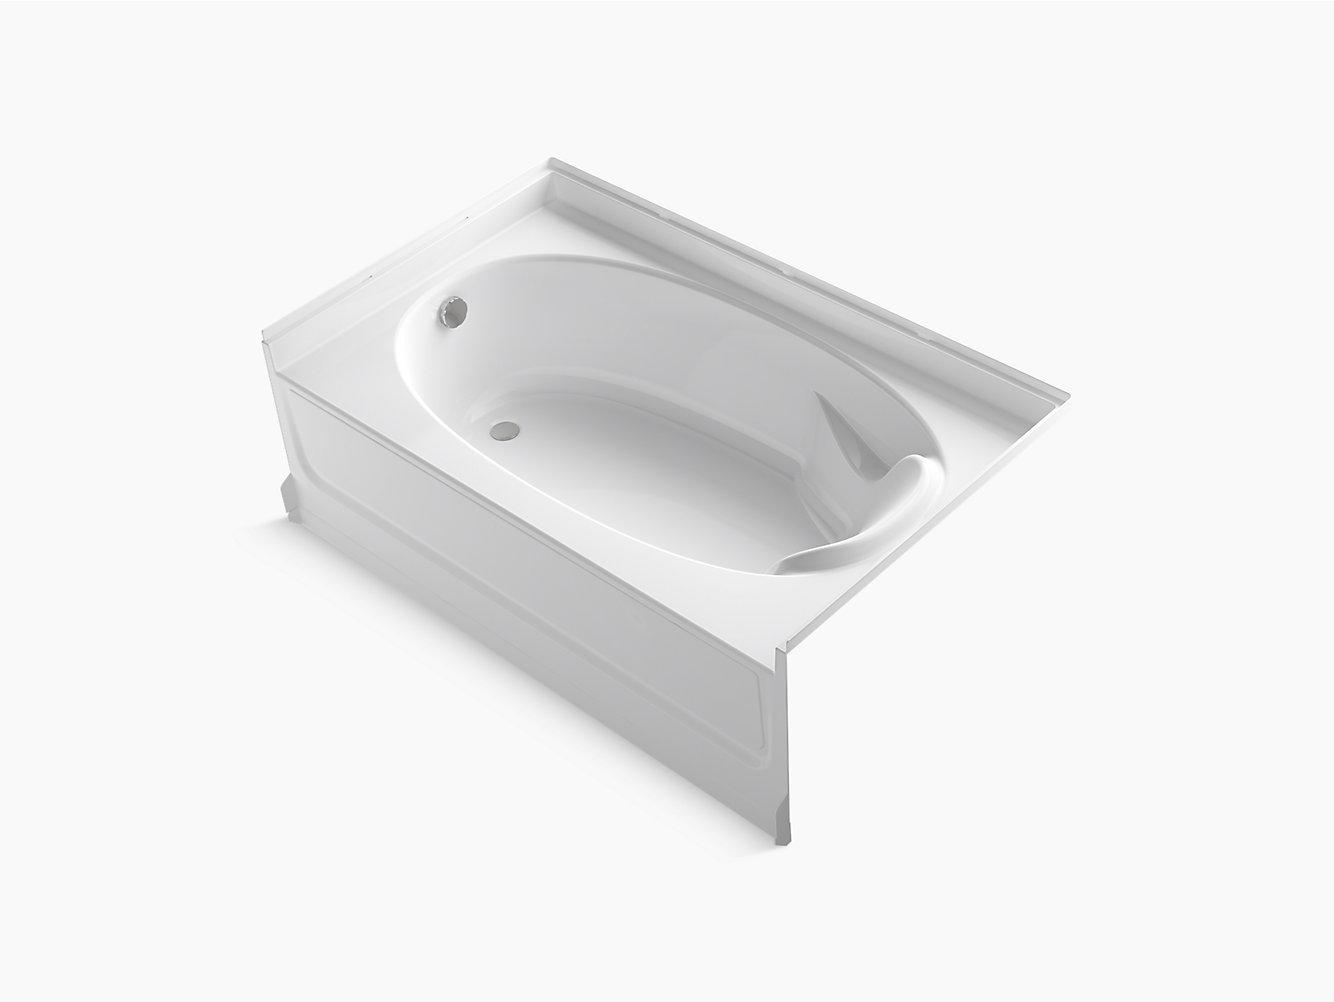 "Ensemble Series 7110, 60"" x 36"" Bath With Above-Floor Drain and ..."